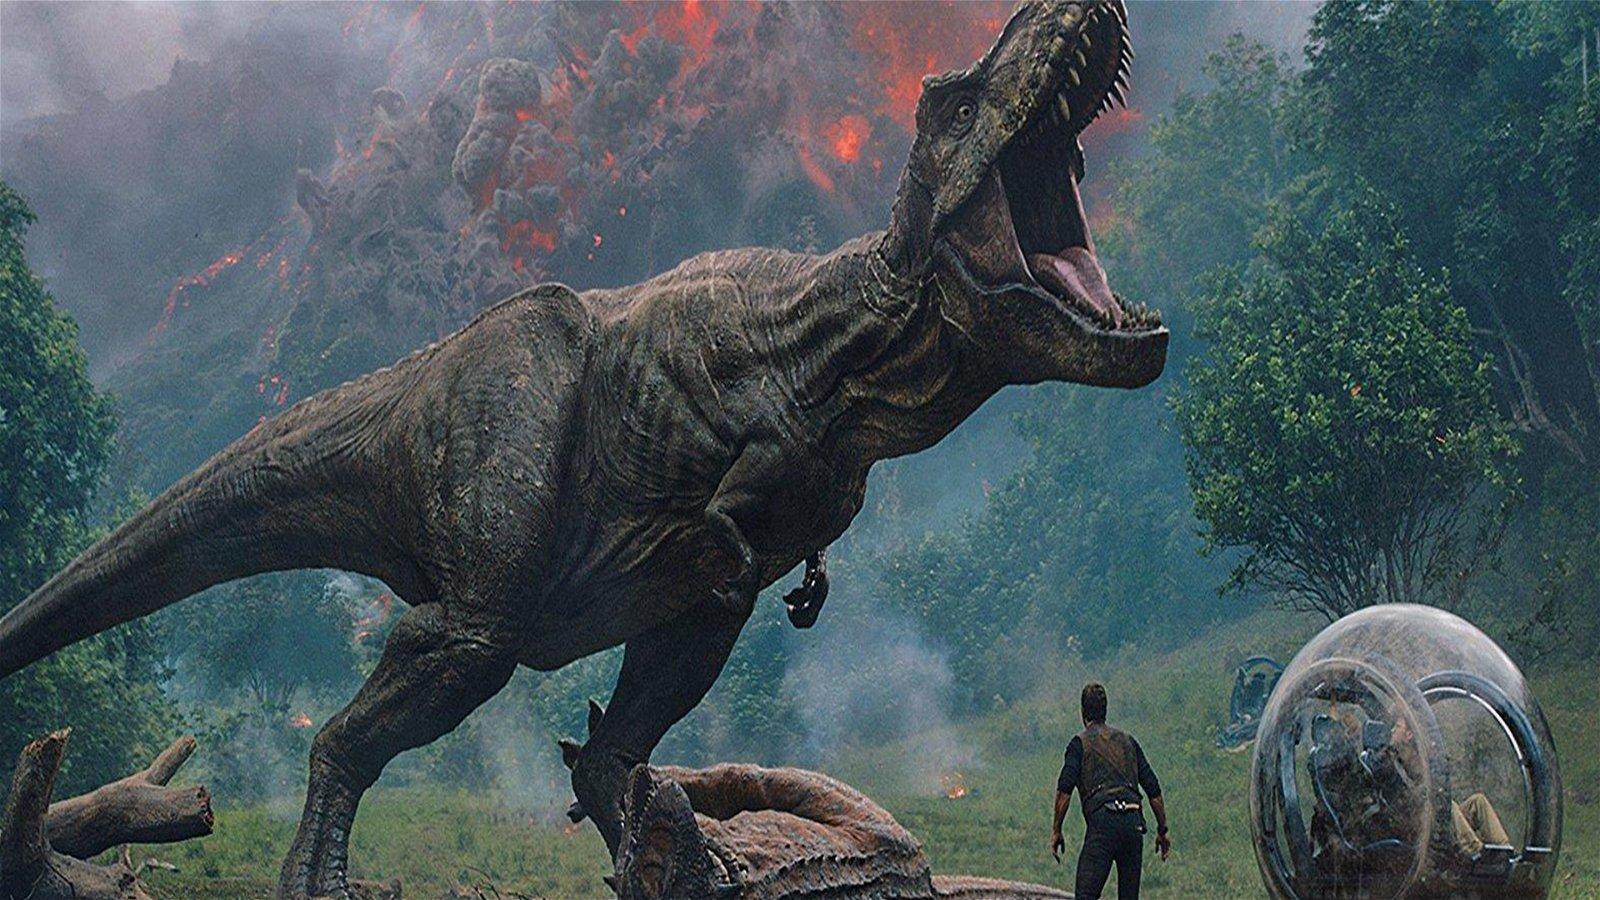 Jurassic World 3 Release Date Announced 1